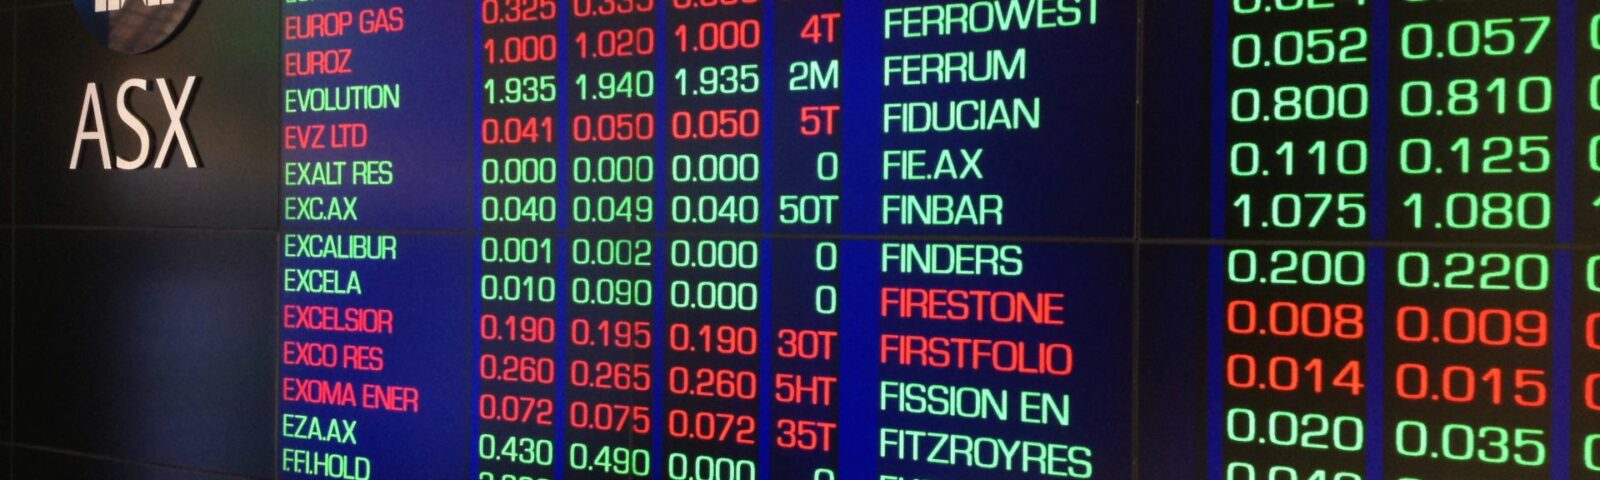 December 2019 New ASX Listing Rules Amendments